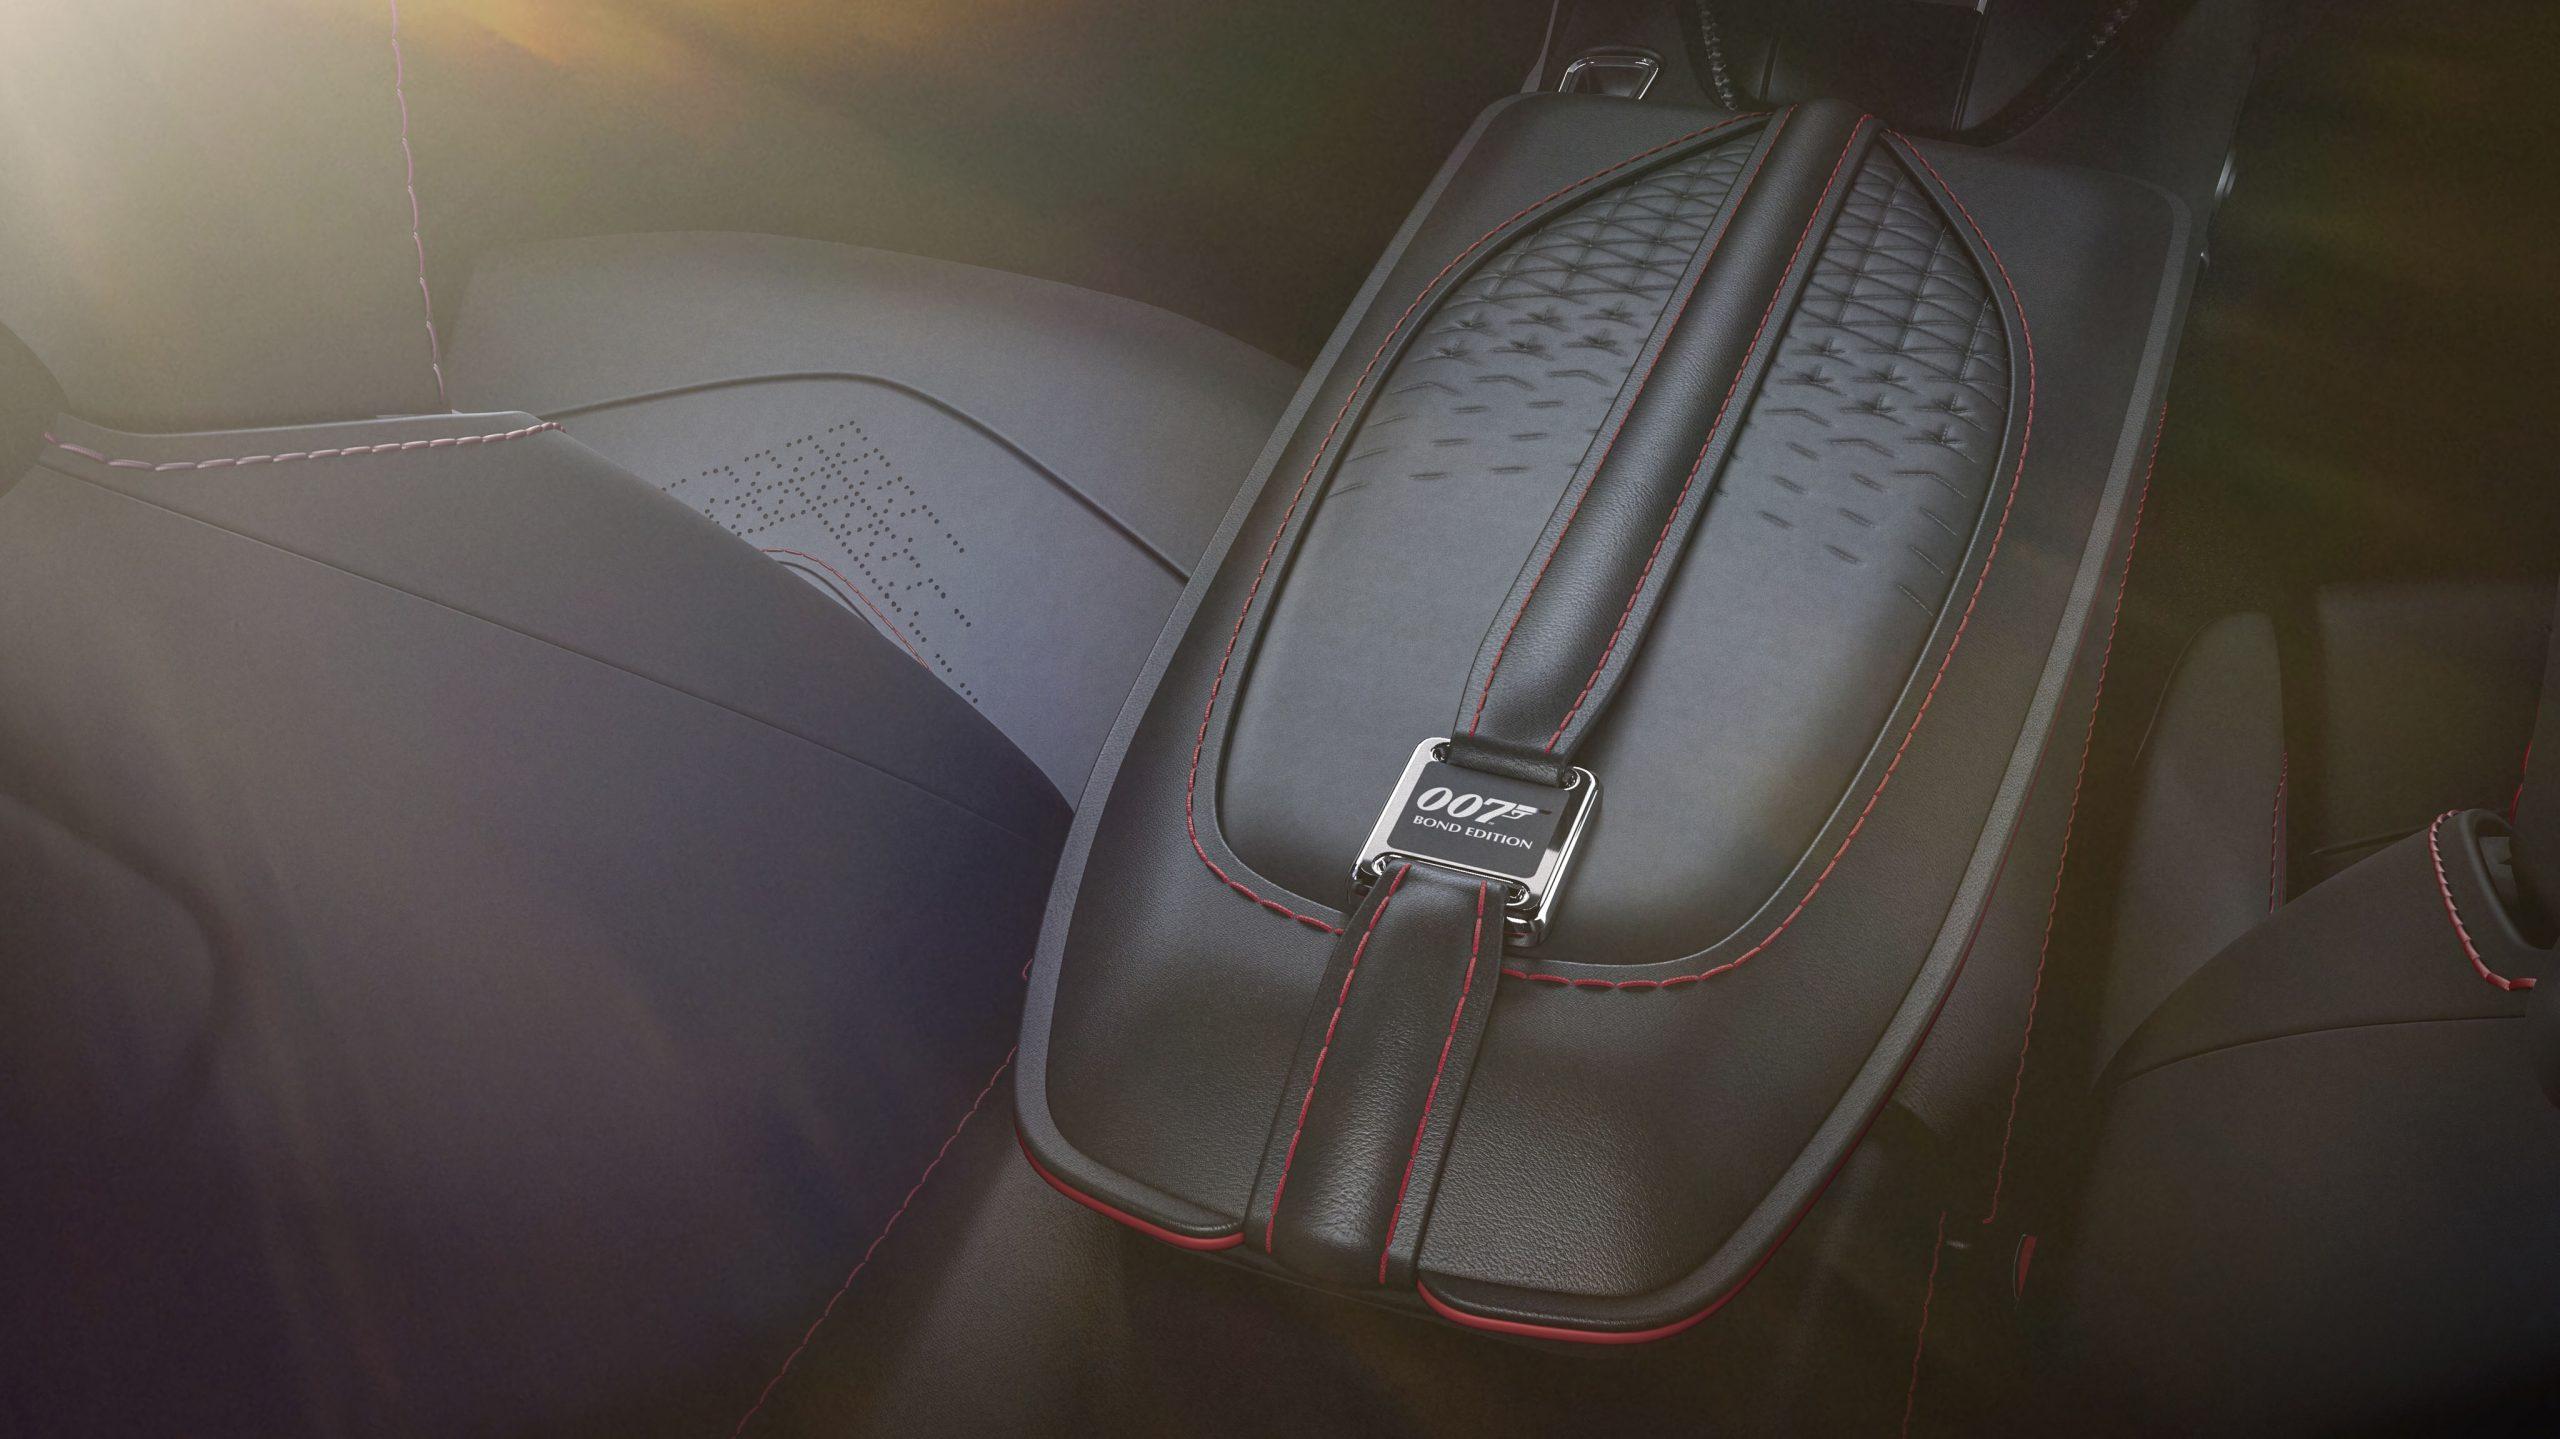 Aston Martin Vantage 007 Edition interior center console